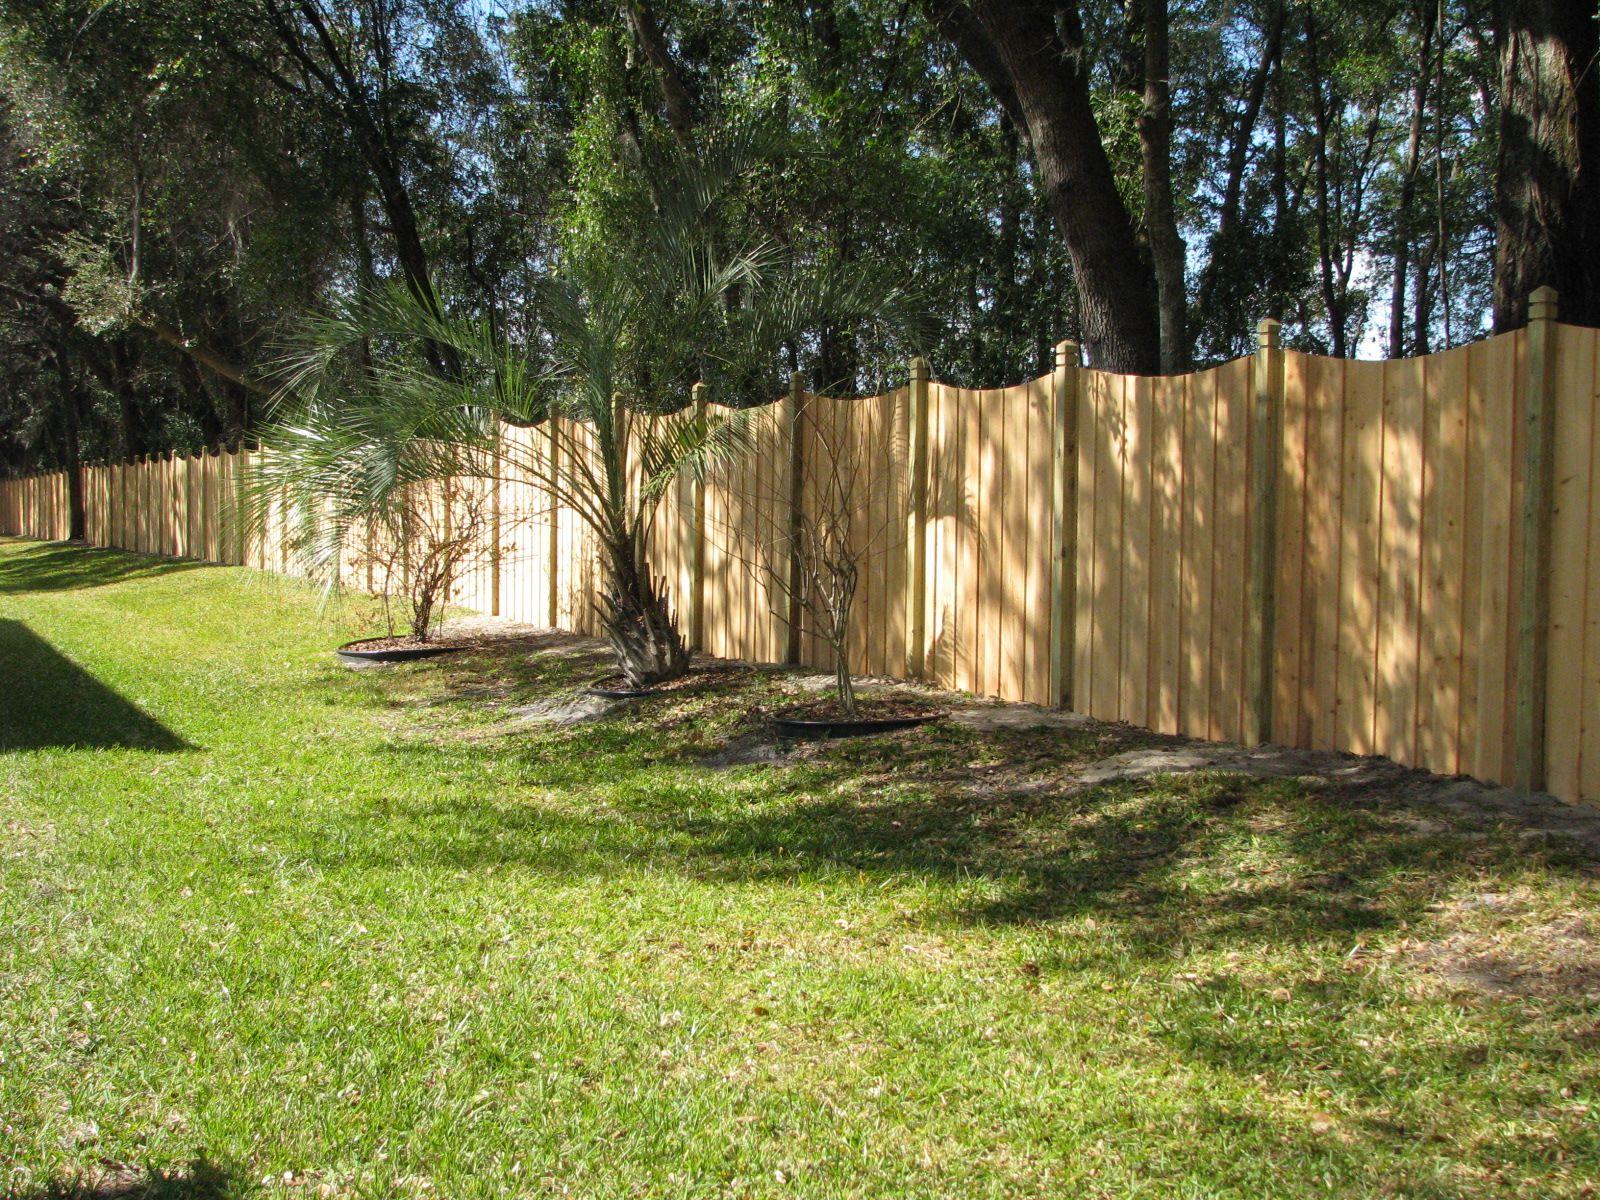 Saddle cut wood privacy fence design mossy oak fence company saddle cut wood privacy fence design mossy oak fence company orlando melbourne baanklon Choice Image